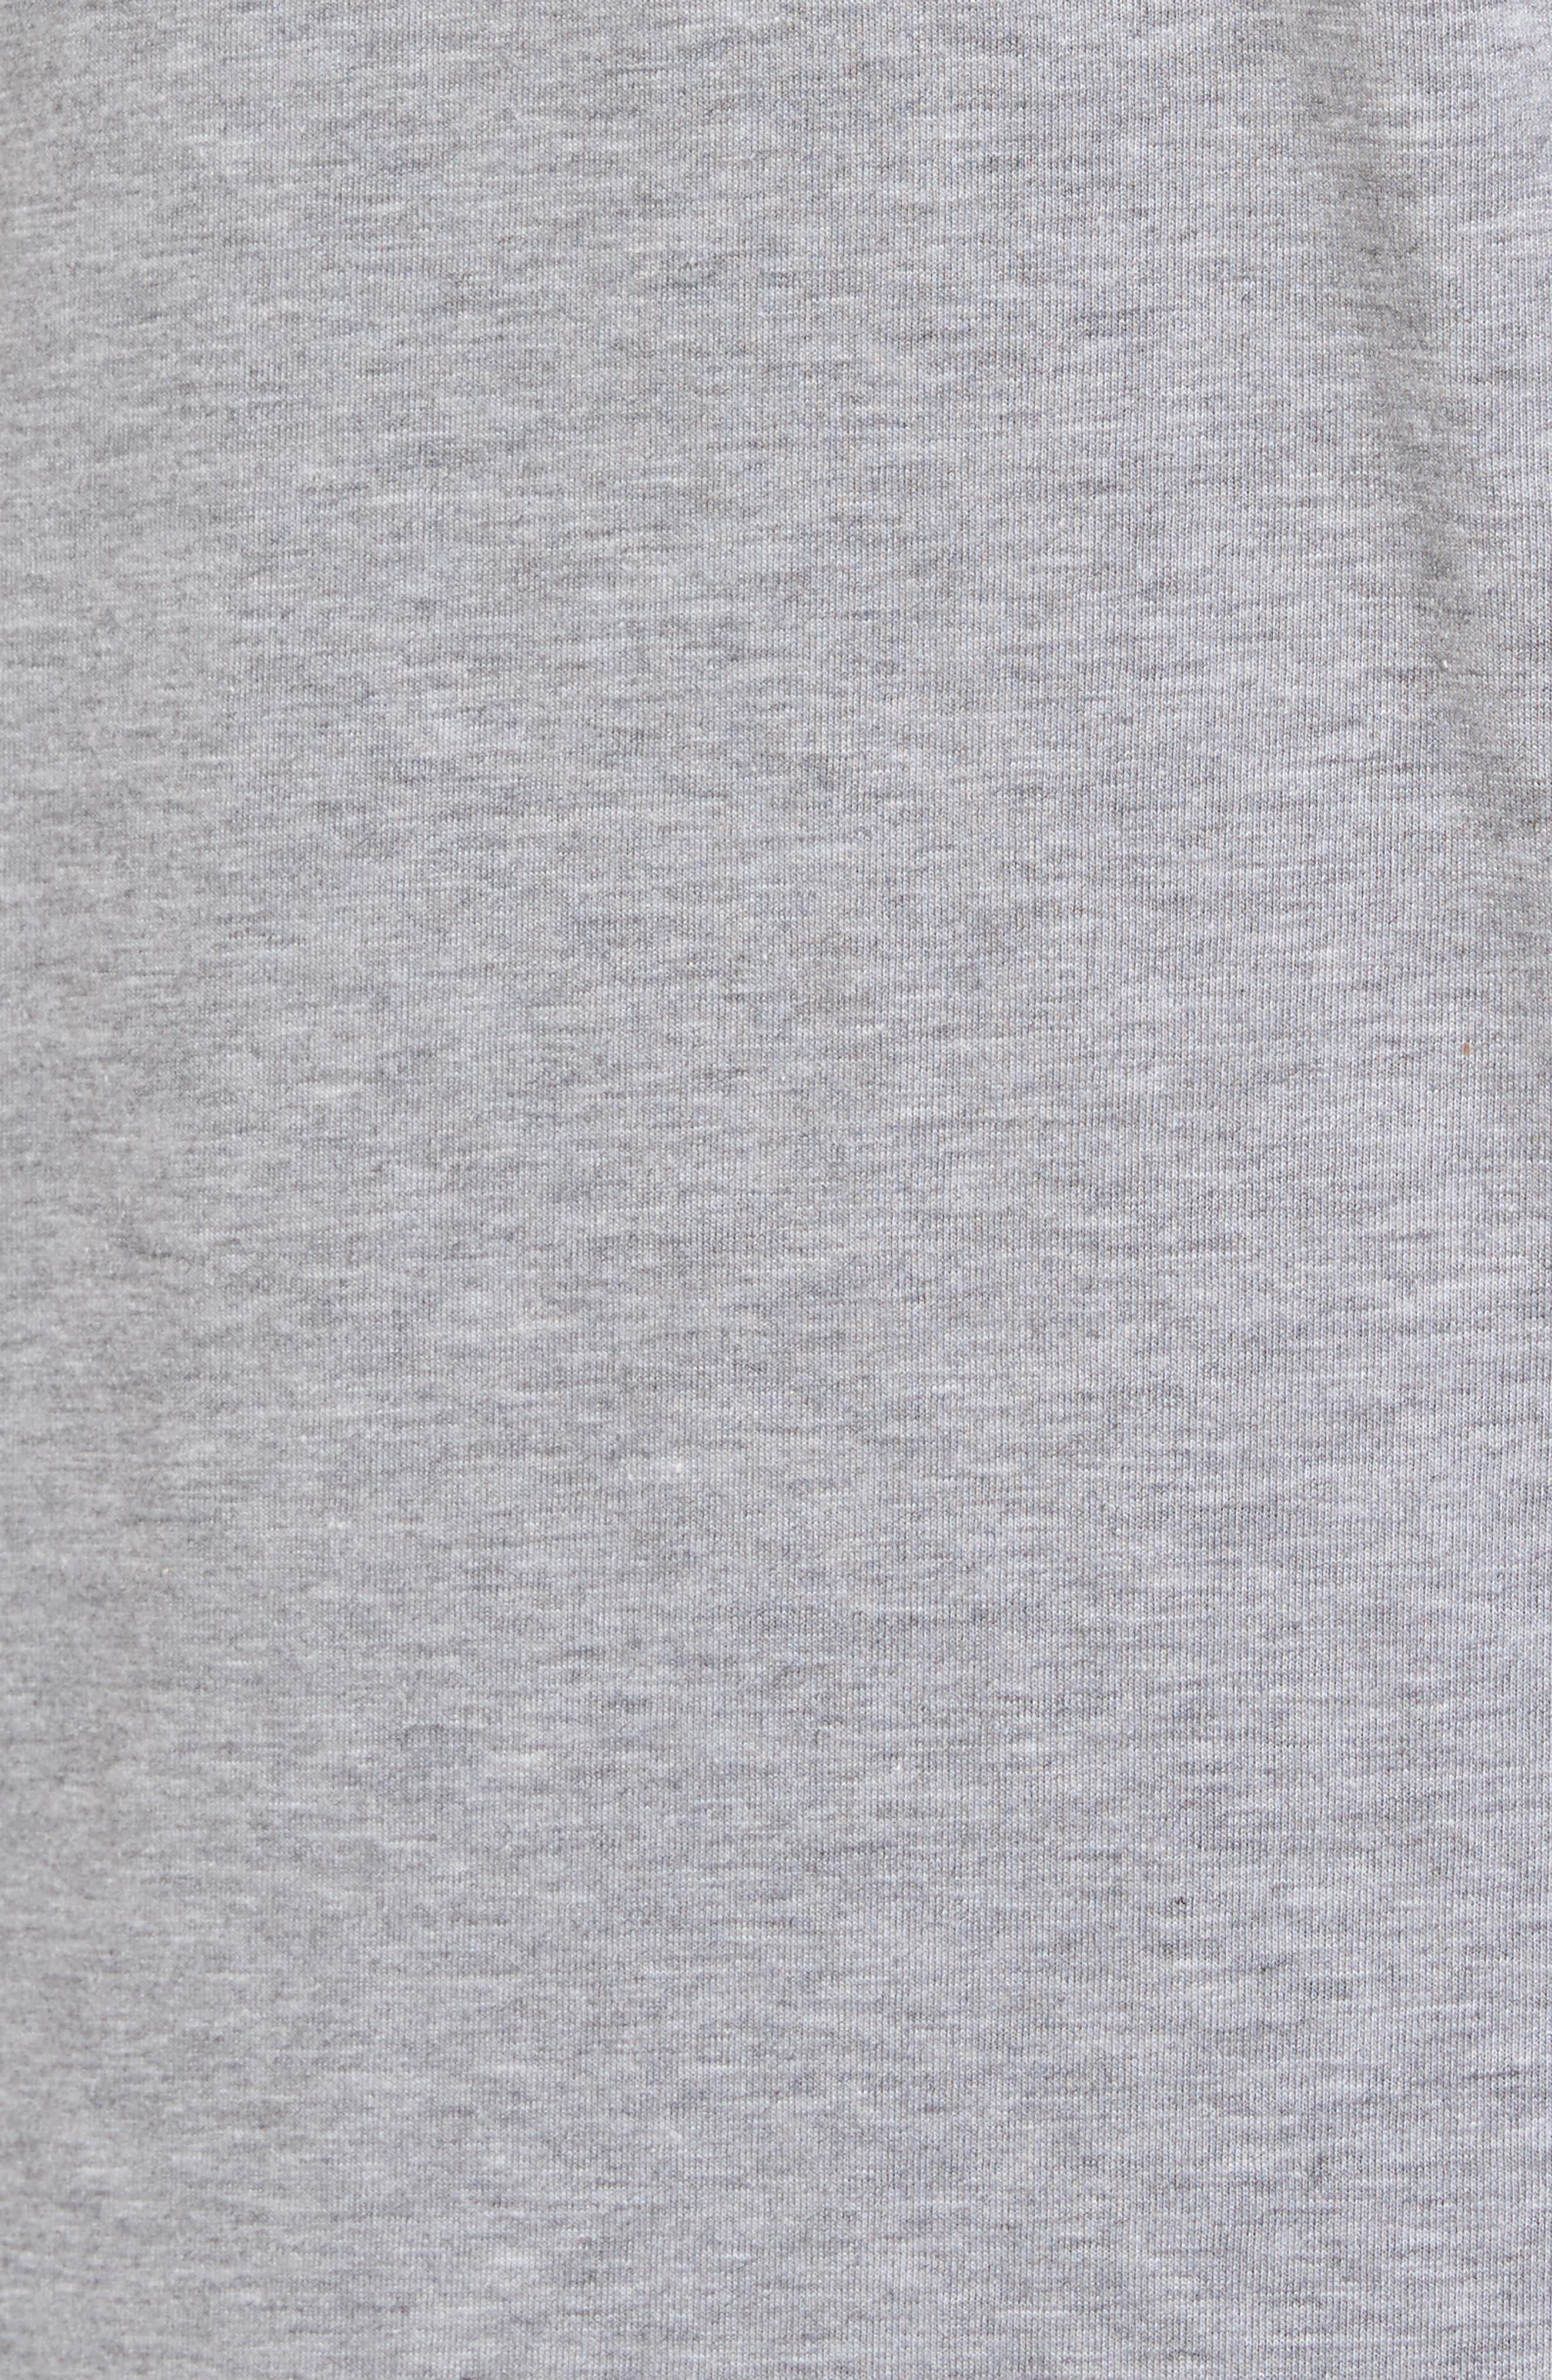 University of Washington Huskies Ringer T-Shirt,                             Alternate thumbnail 5, color,                             020